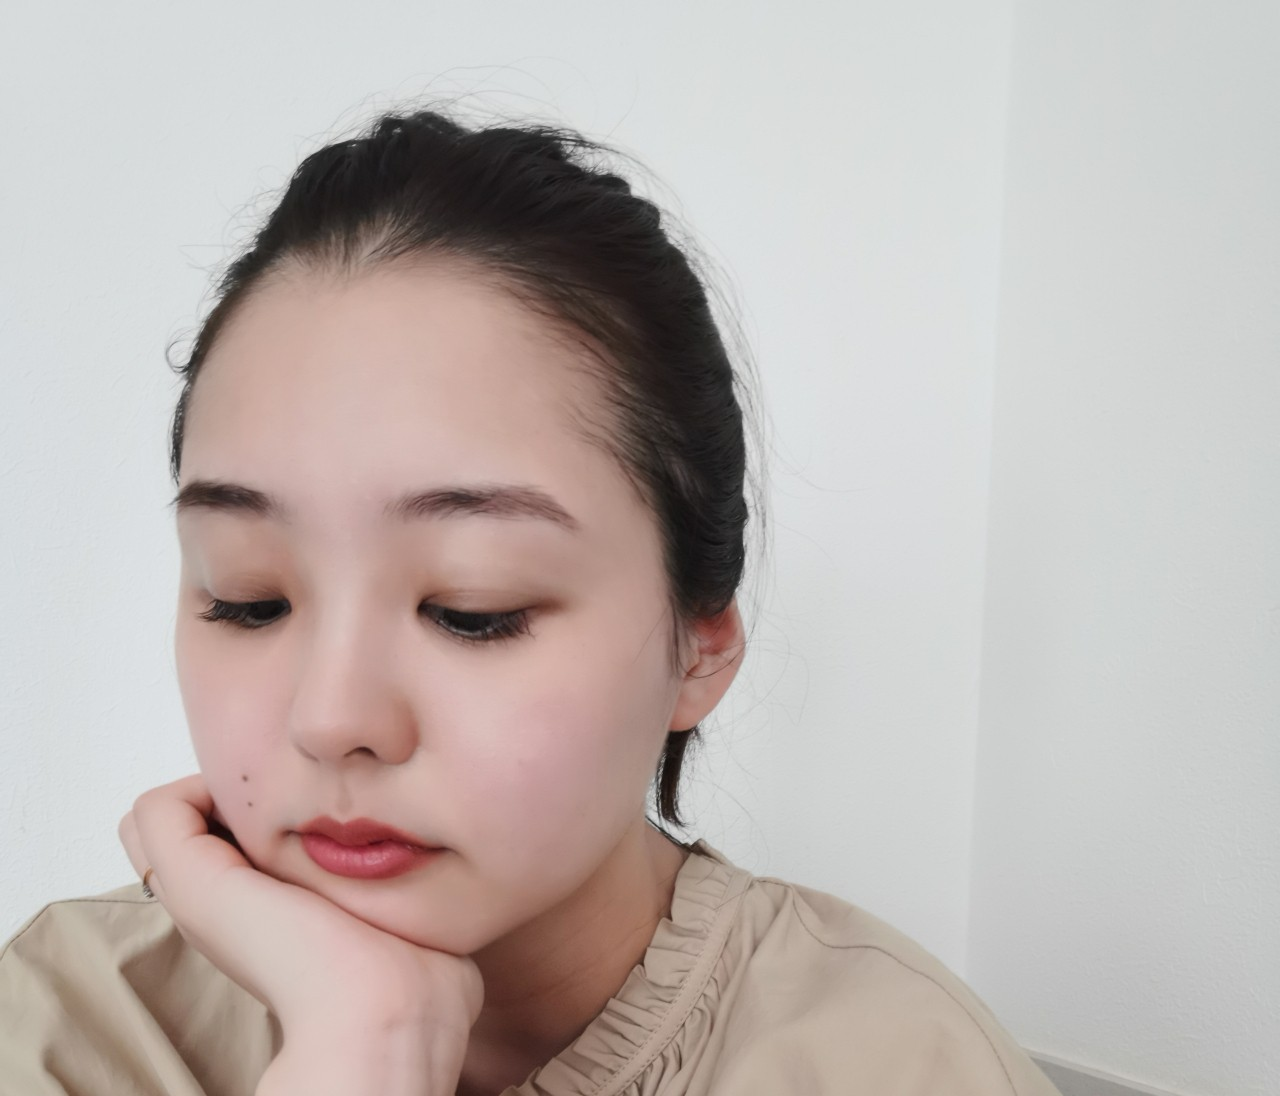 【BAILA12月号付録】天才眉ブラシで自分史上眉!!